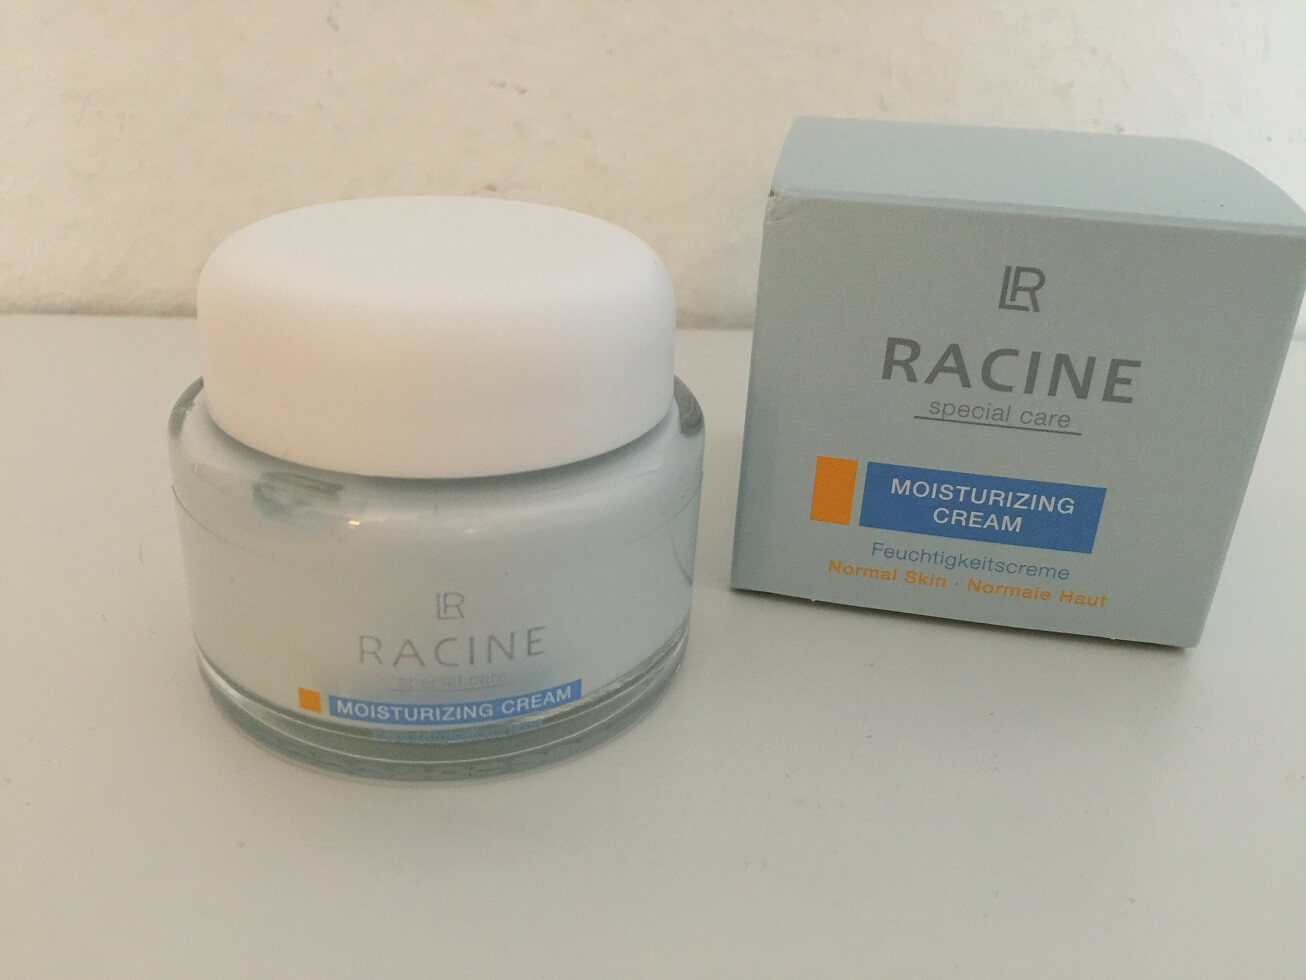 LR RACINE Special Care Feuchtigkeitscreme